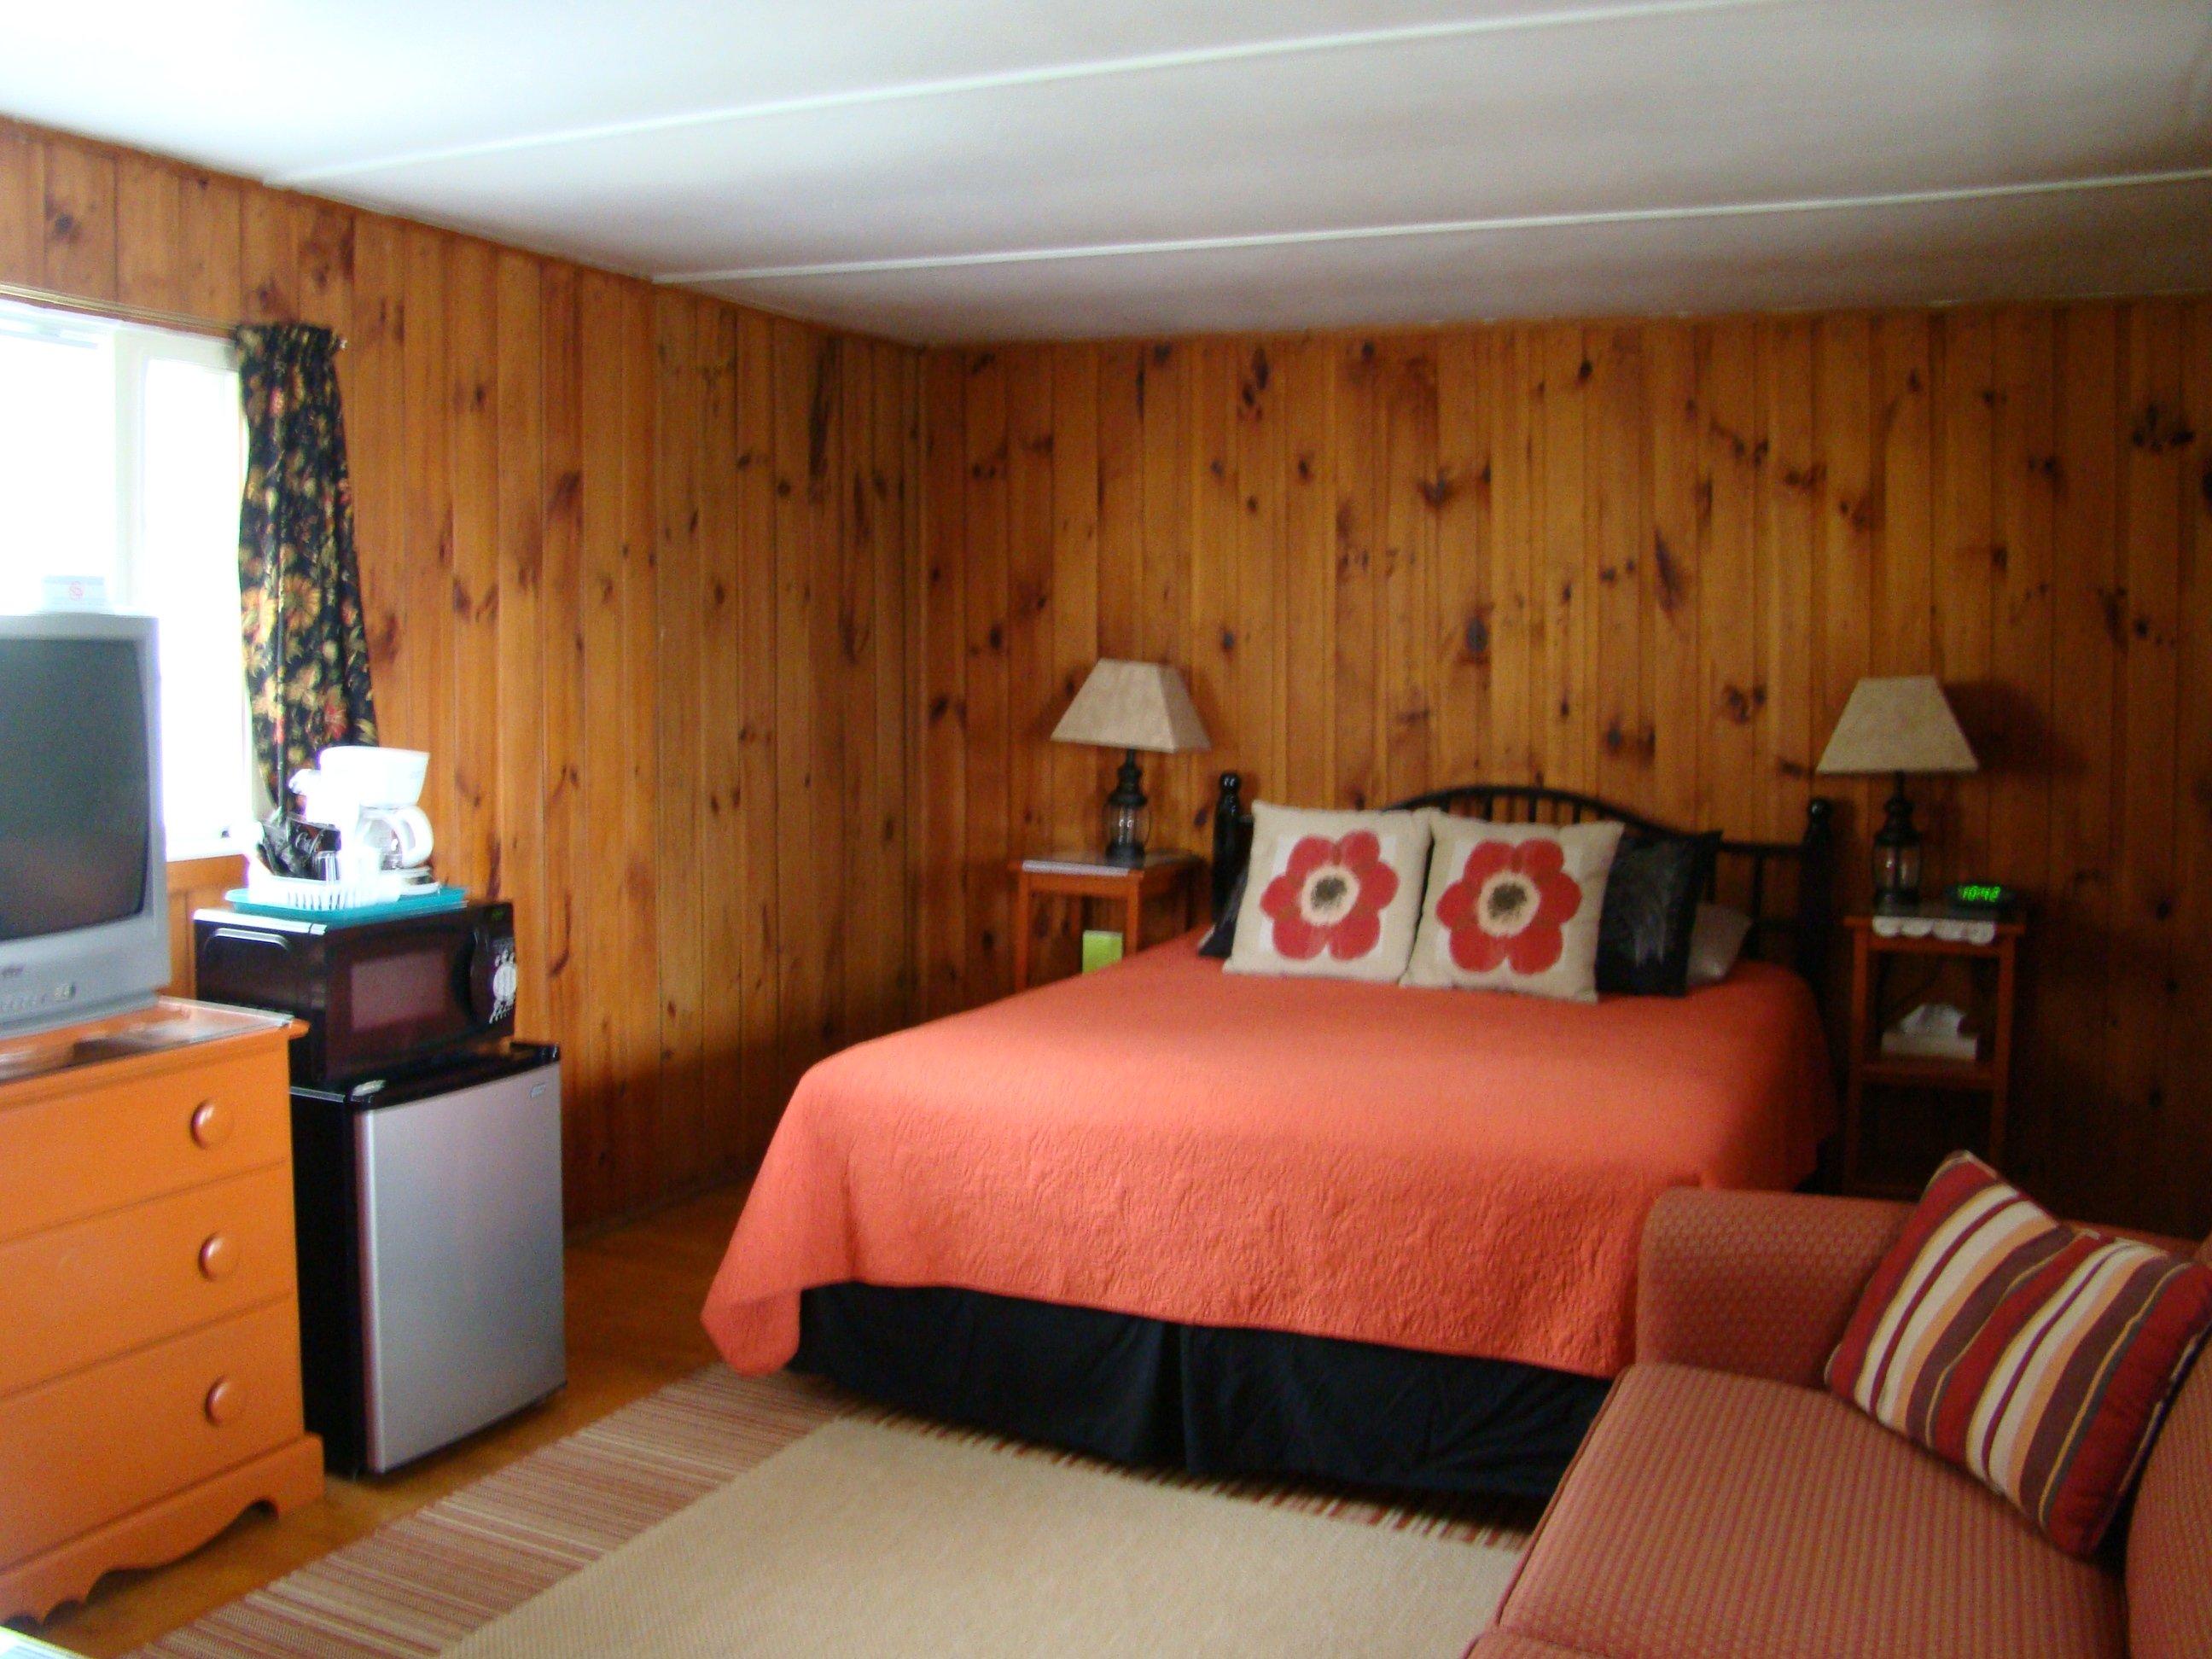 Motel room #15 - queen bed, full sleeper sofa, TV, refrigerator, microwave, coffeemaker